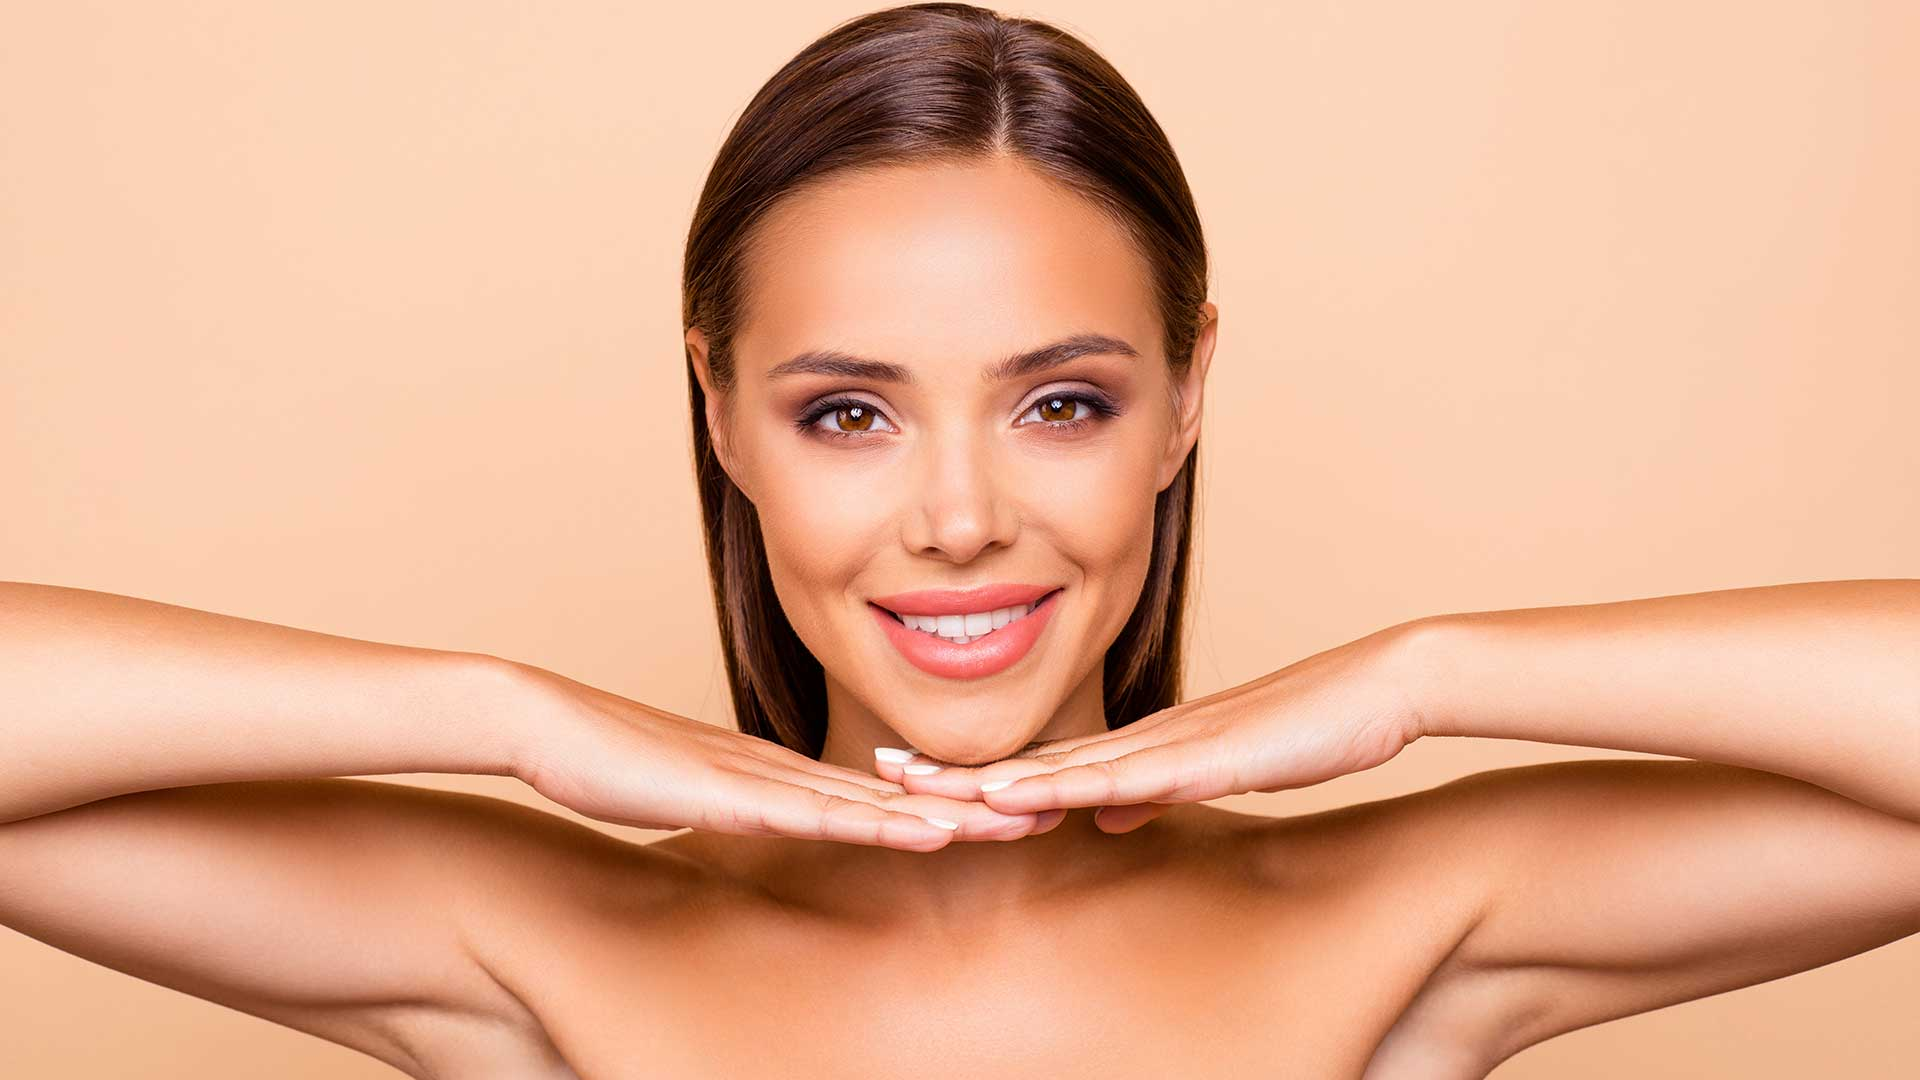 botox-botuliniumtoxin-behandlung-nase-lippen-augenringe